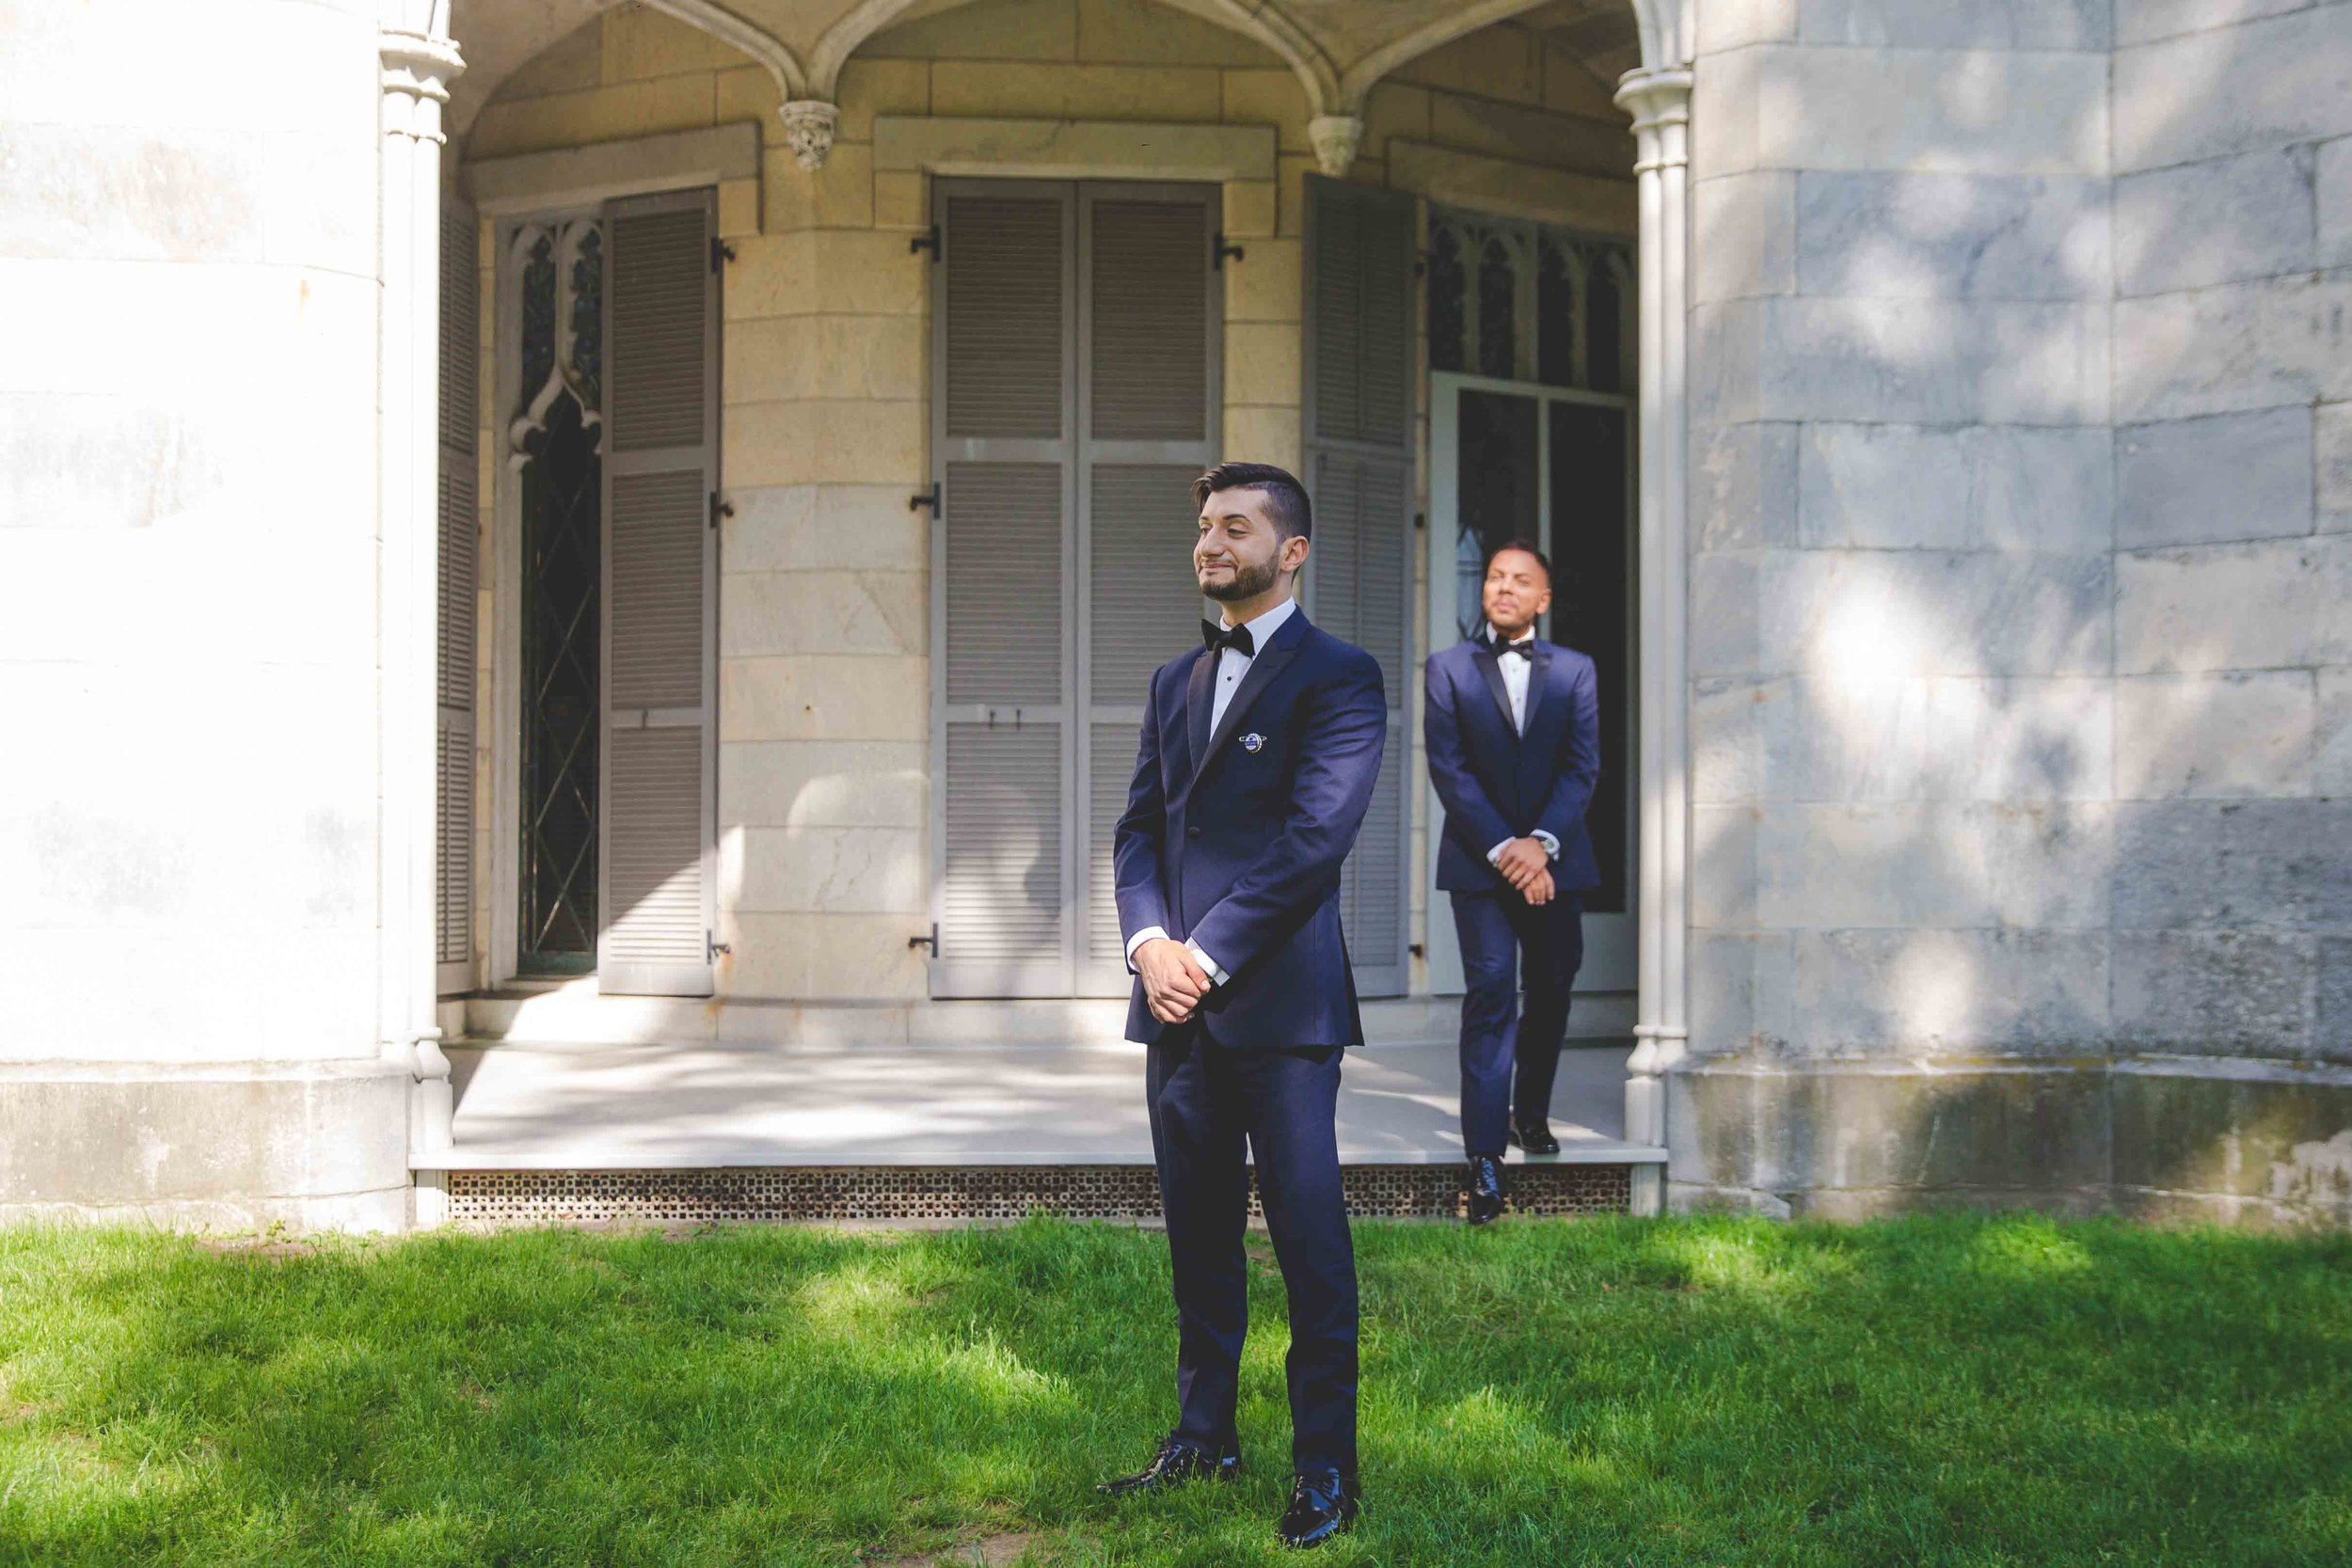 lyndhurst-mansion-amazing-gay-wedding-4.jpg